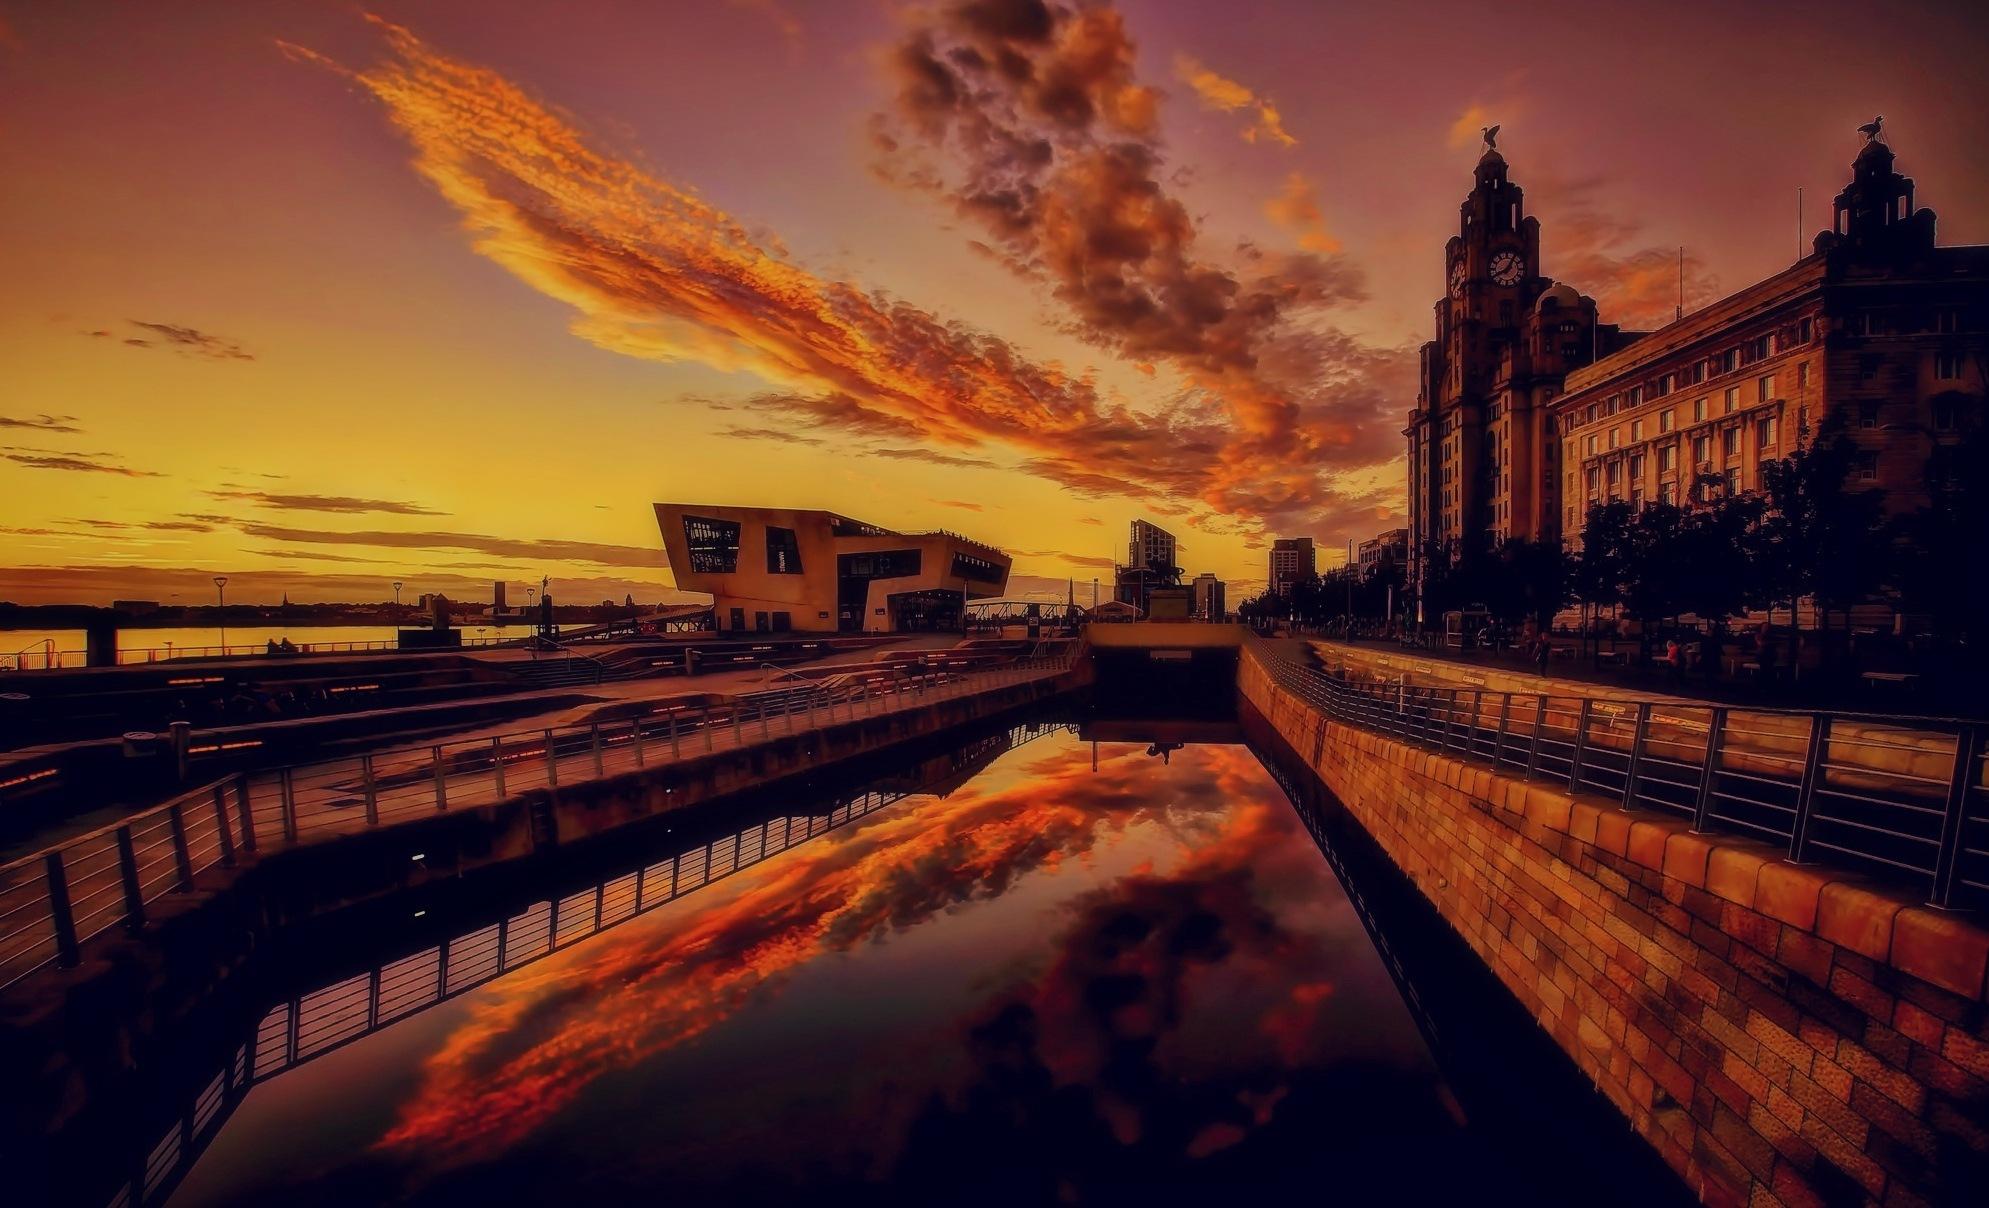 CLOUD CATCHER by Derek Tomkins